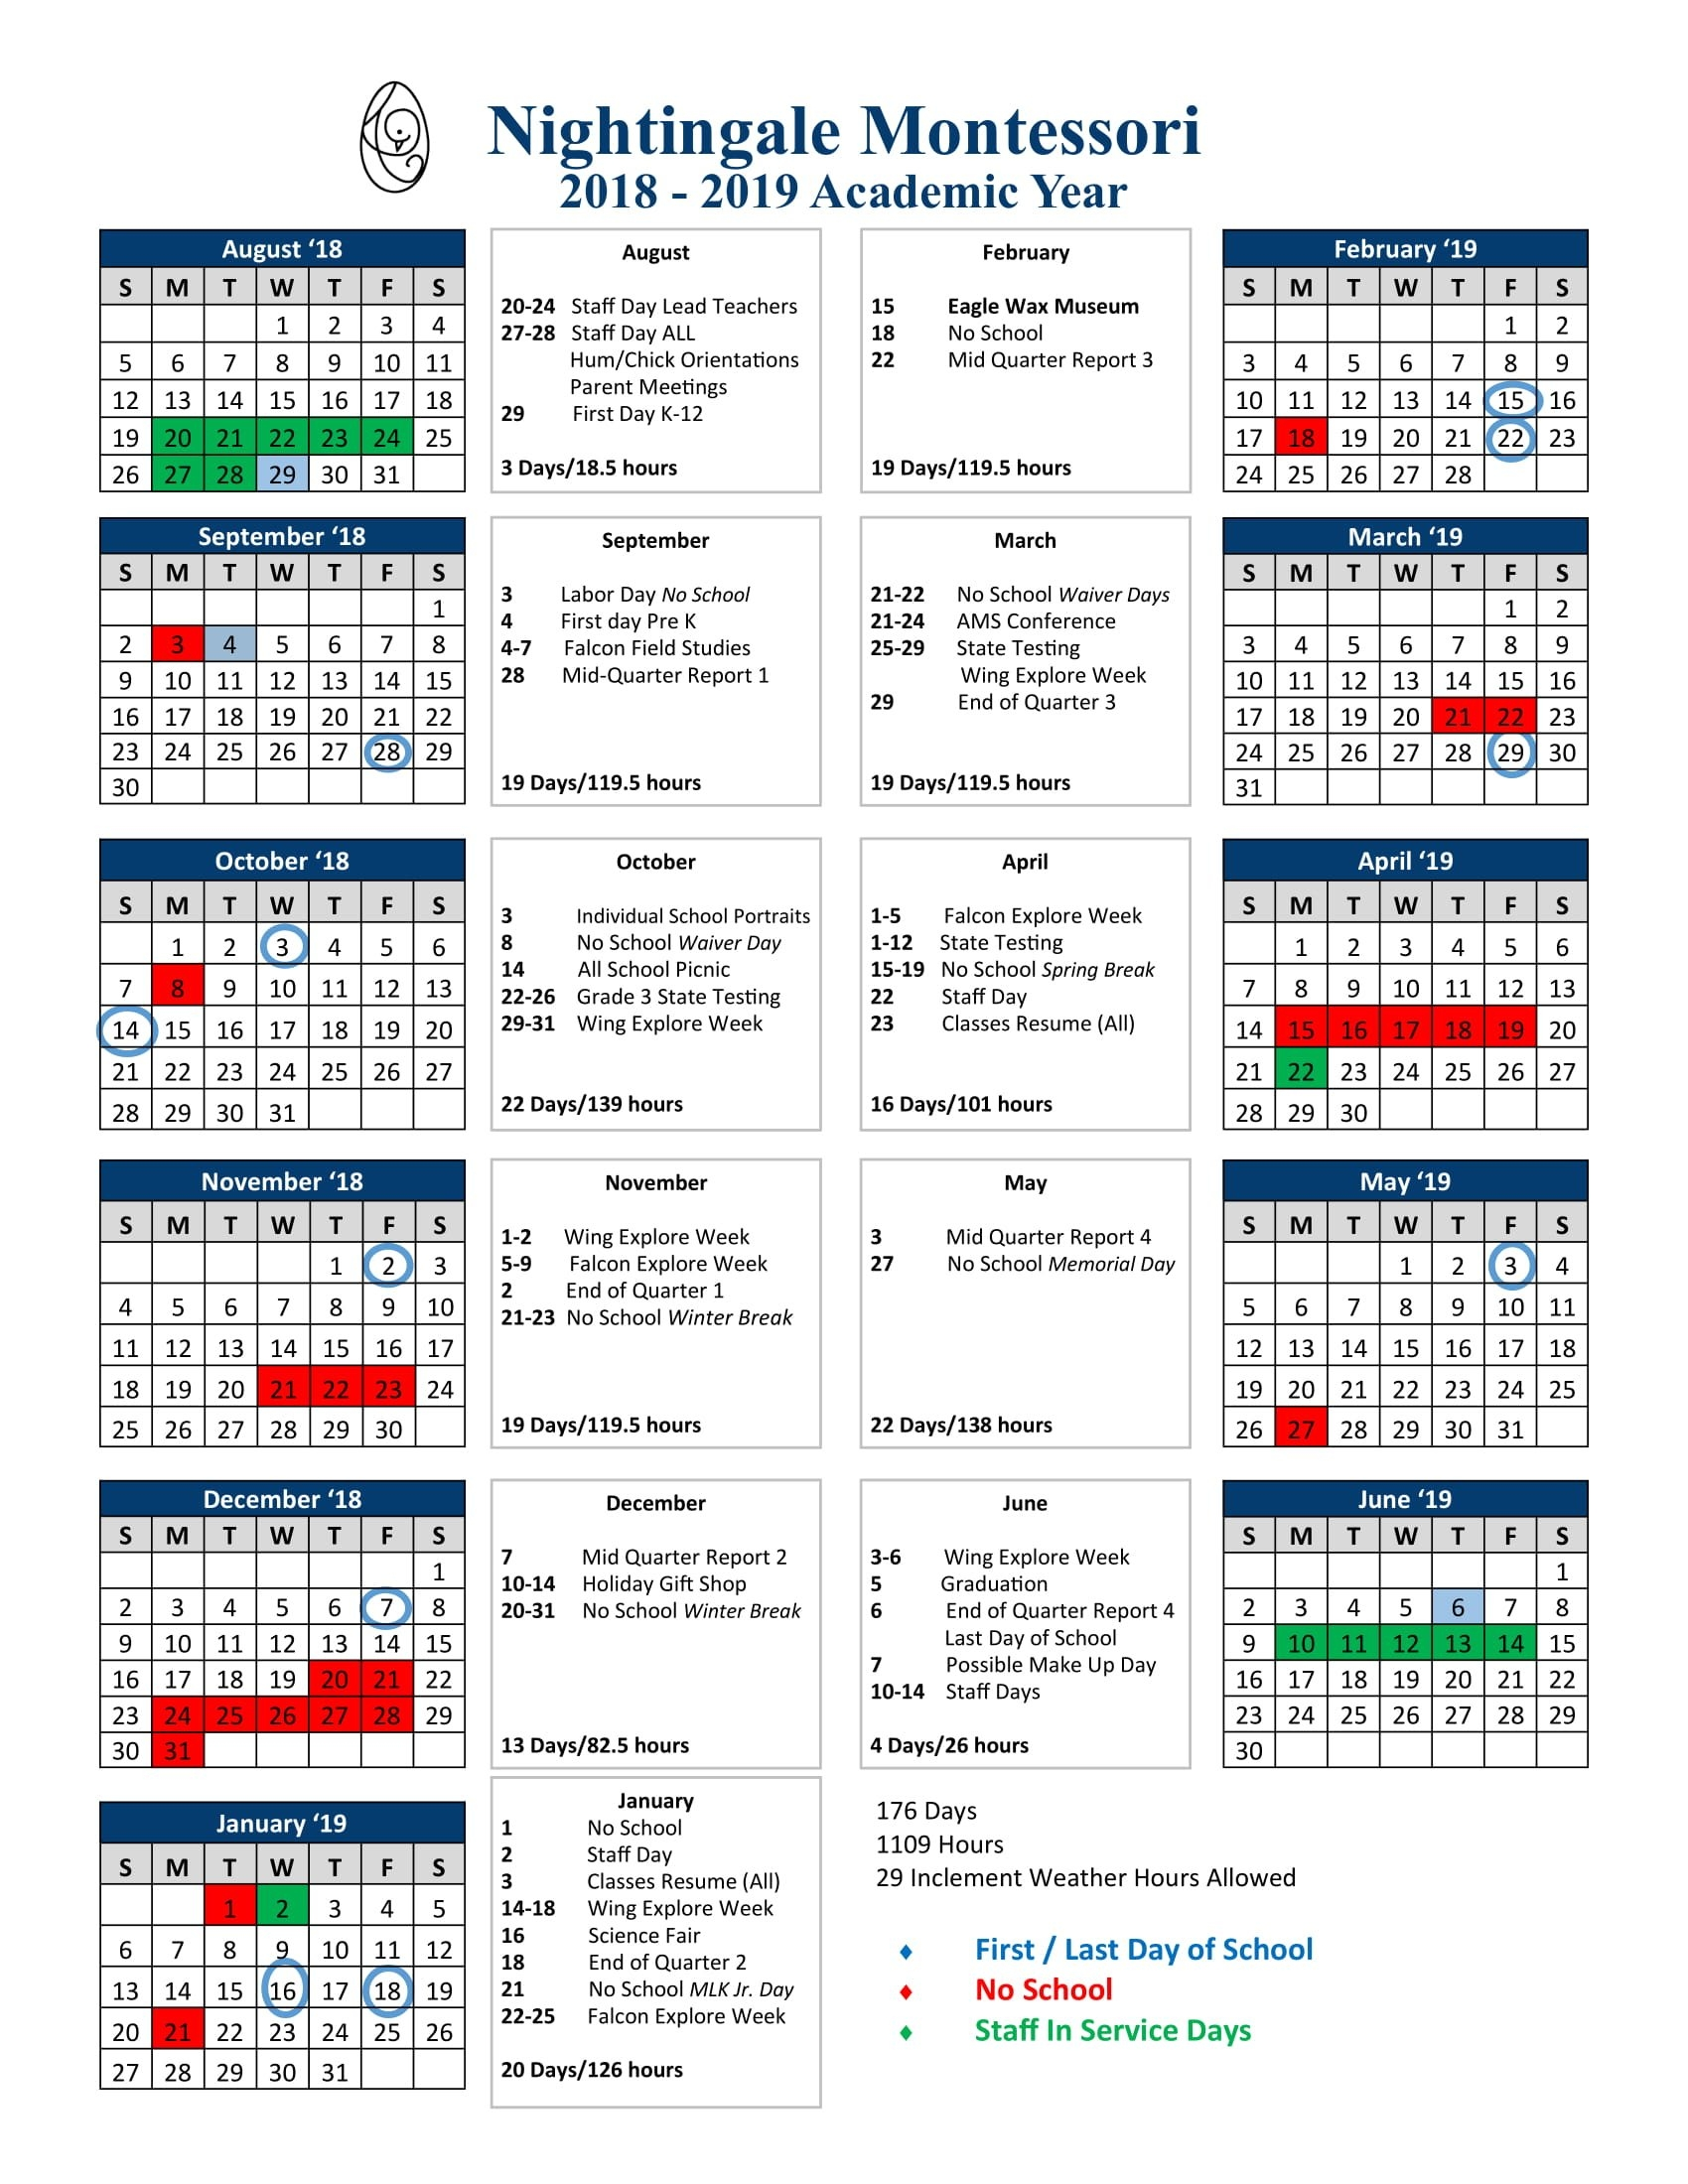 Annual Calendar – Nightingale Montessori K State Calendar Spring 2019